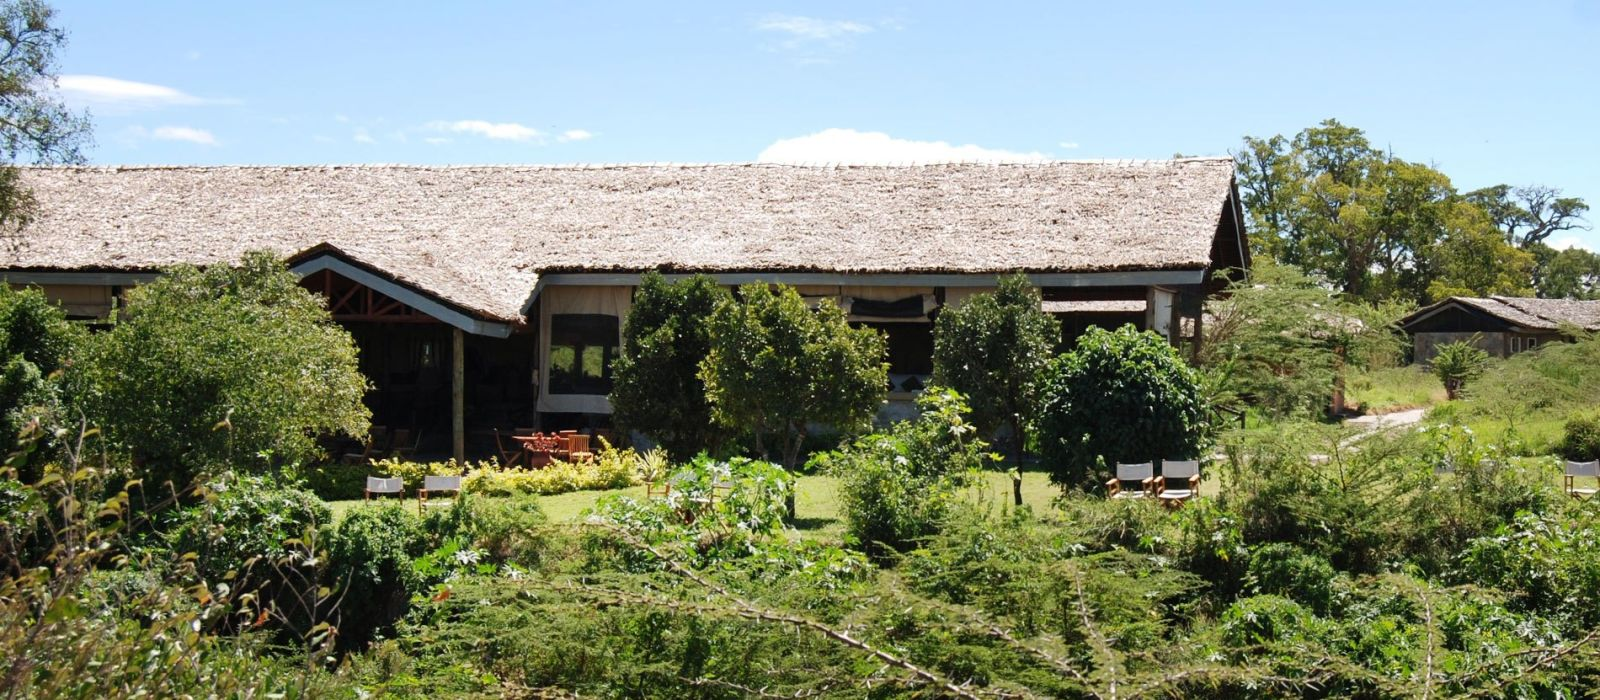 Hotel Tipilikwani Mara Camp Kenia